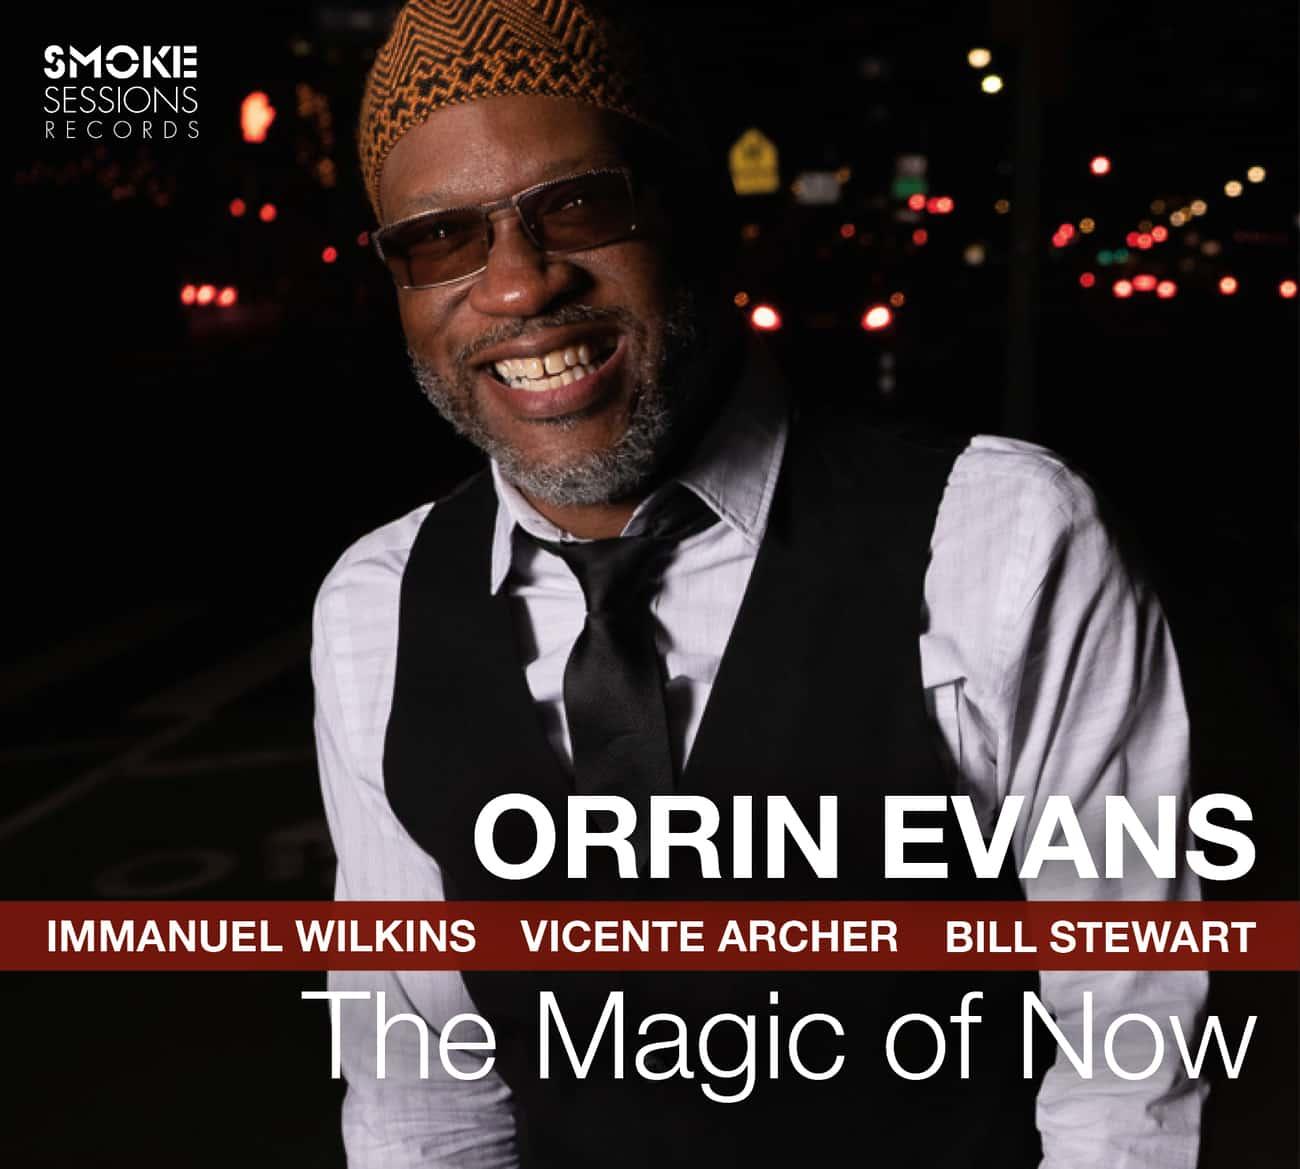 Orrin Evans THE MAGIC OF NOW_Cover darker